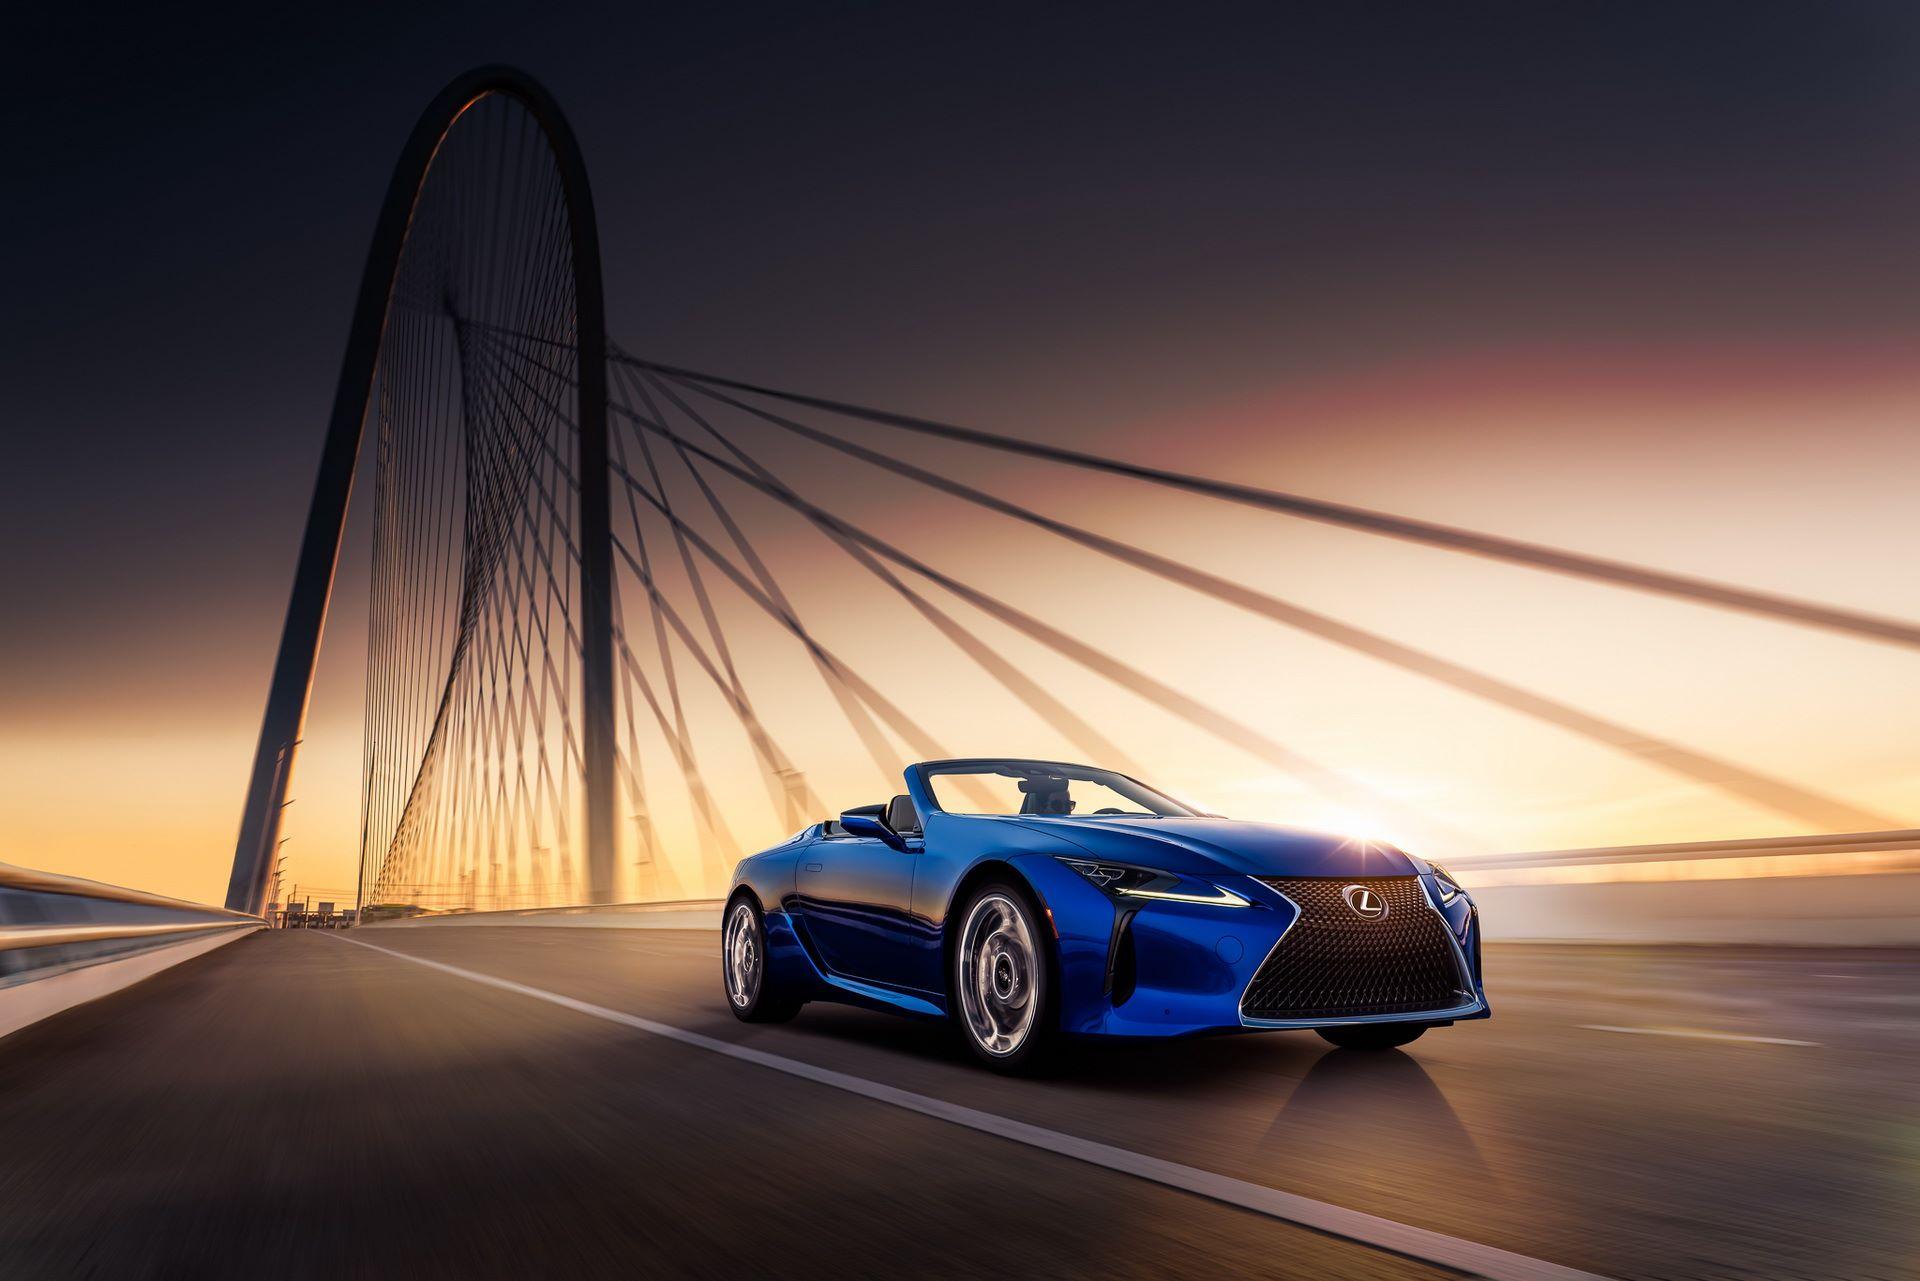 Lexus-LC-500-Convertible-Regatta-Edition-16